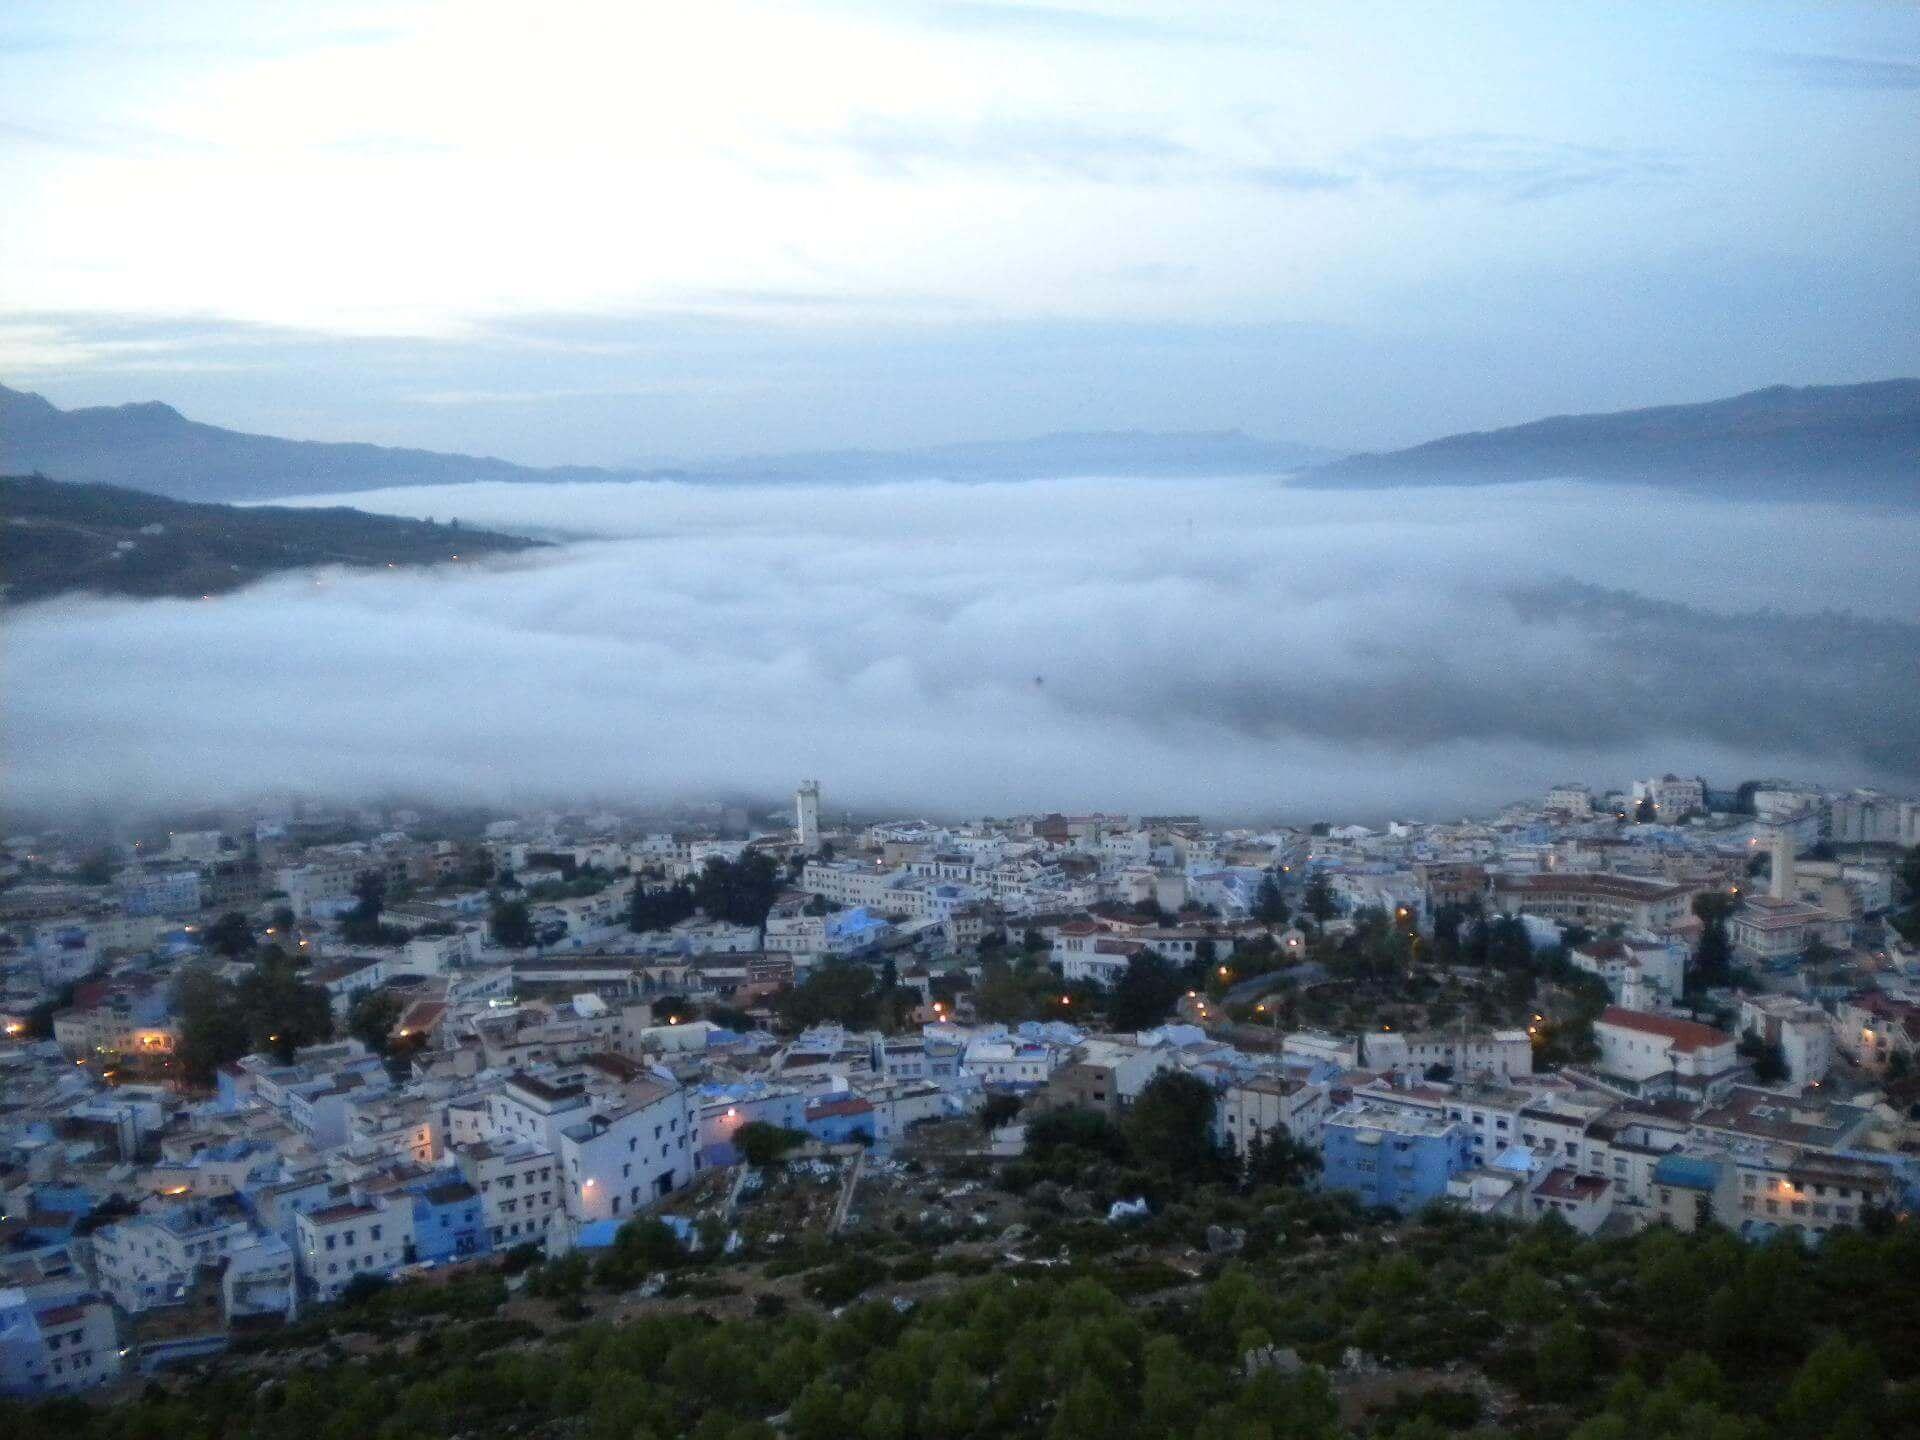 Algeciras - Chefchauen